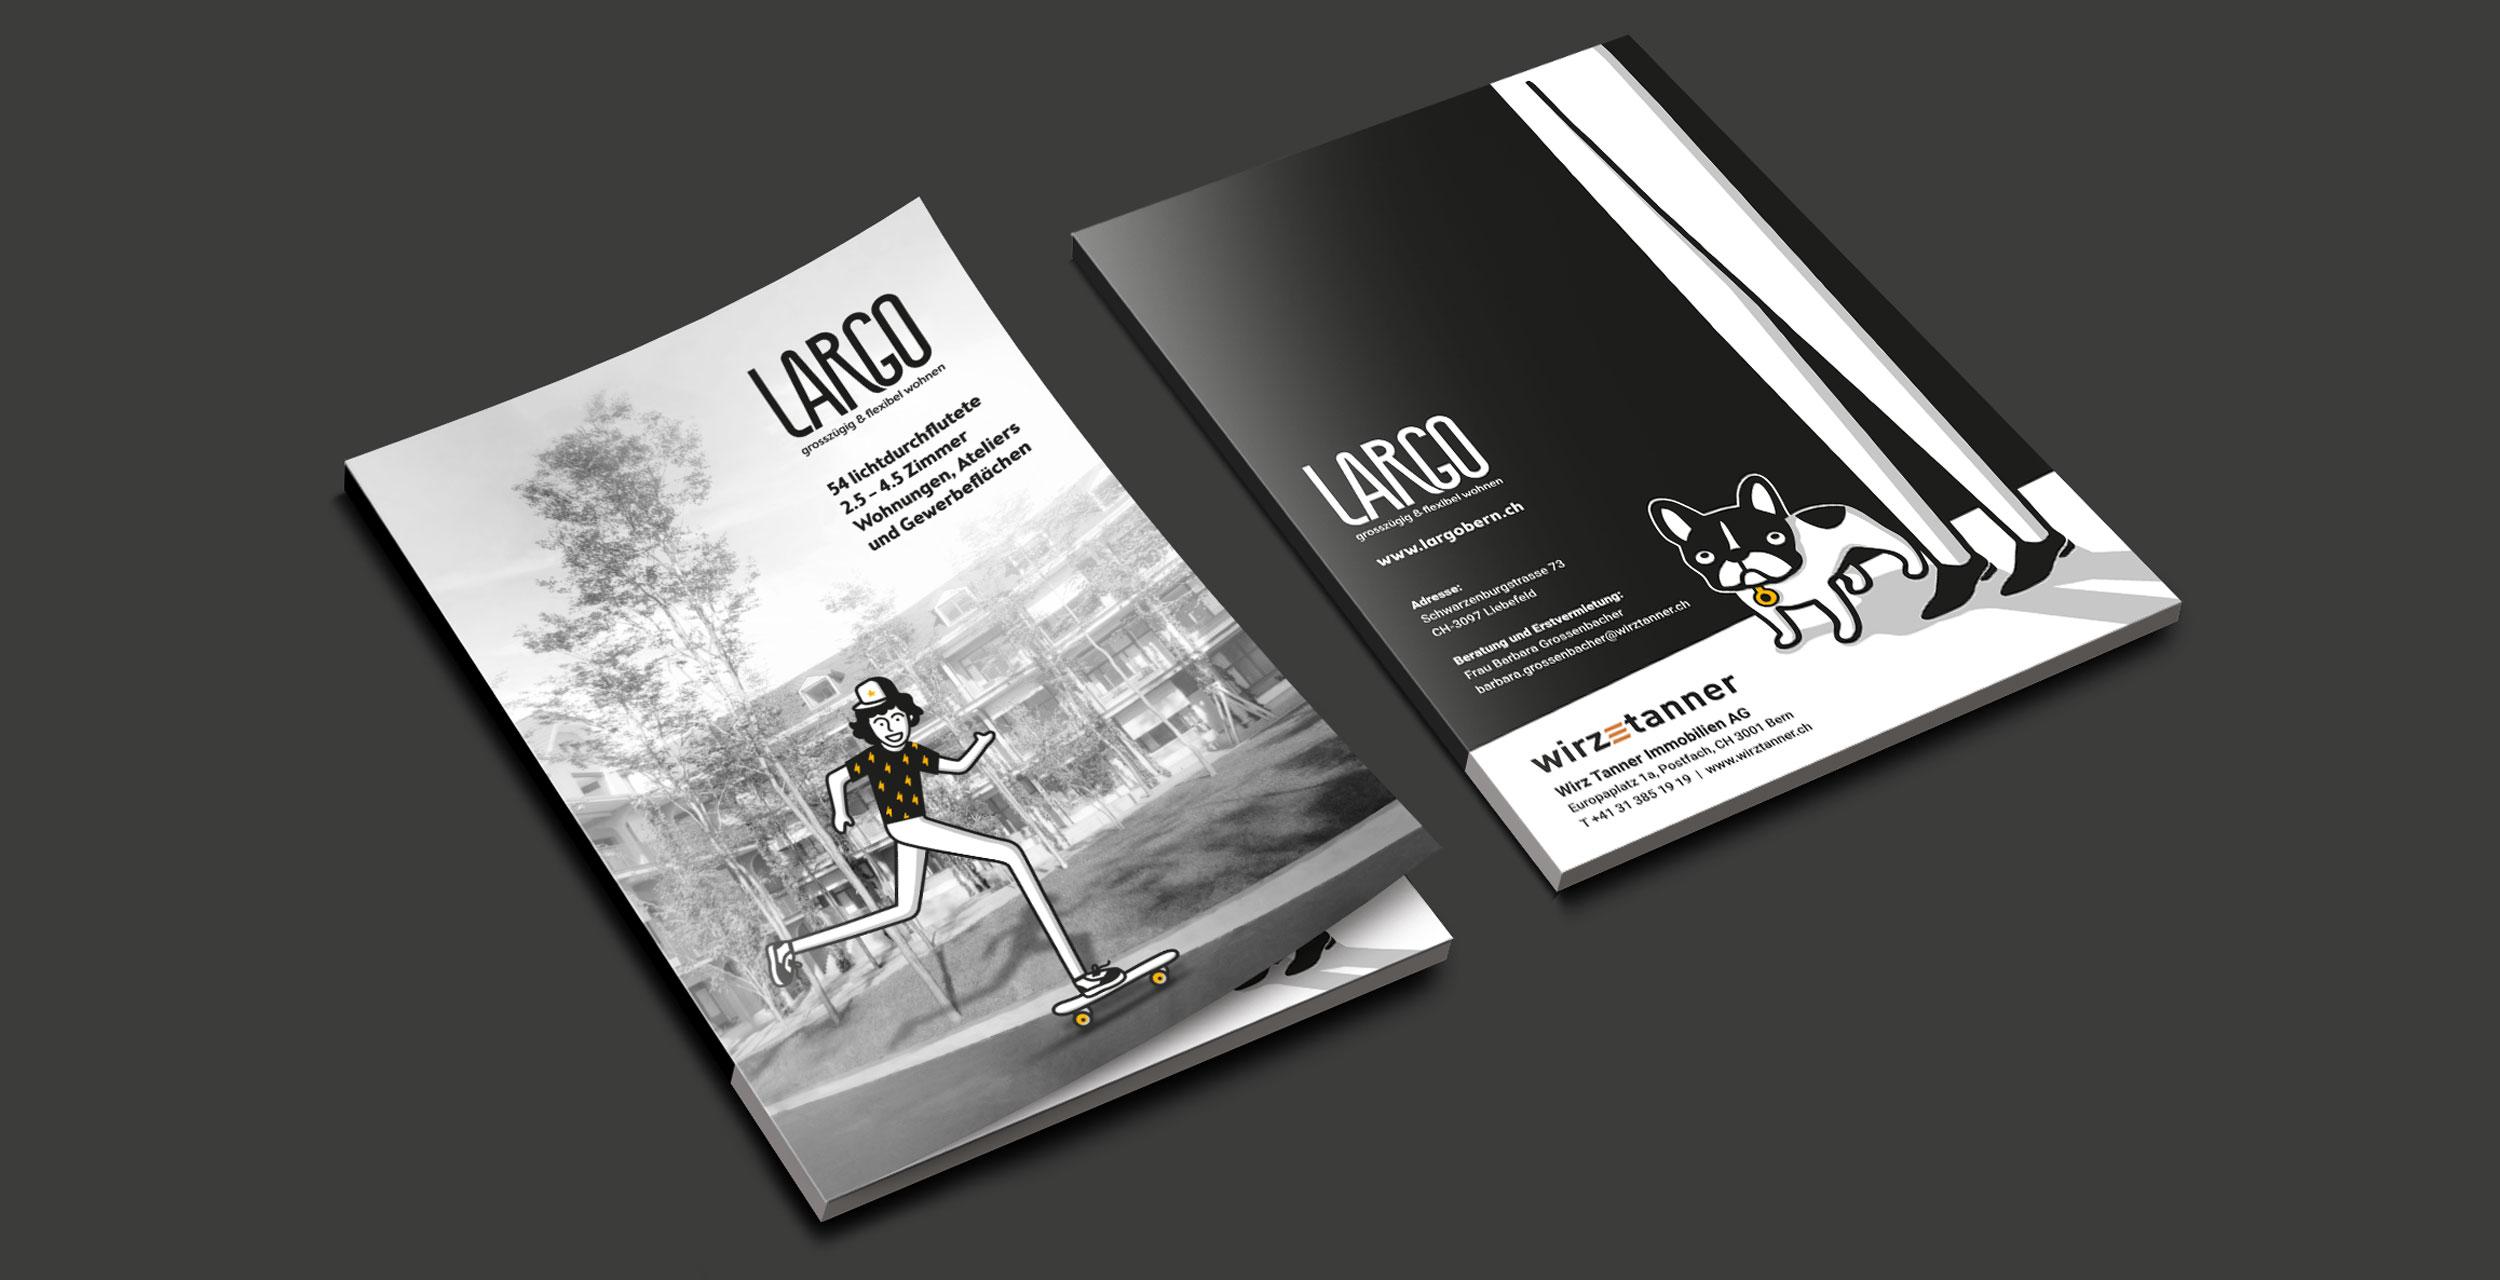 LARGO informative folder by GPU Design